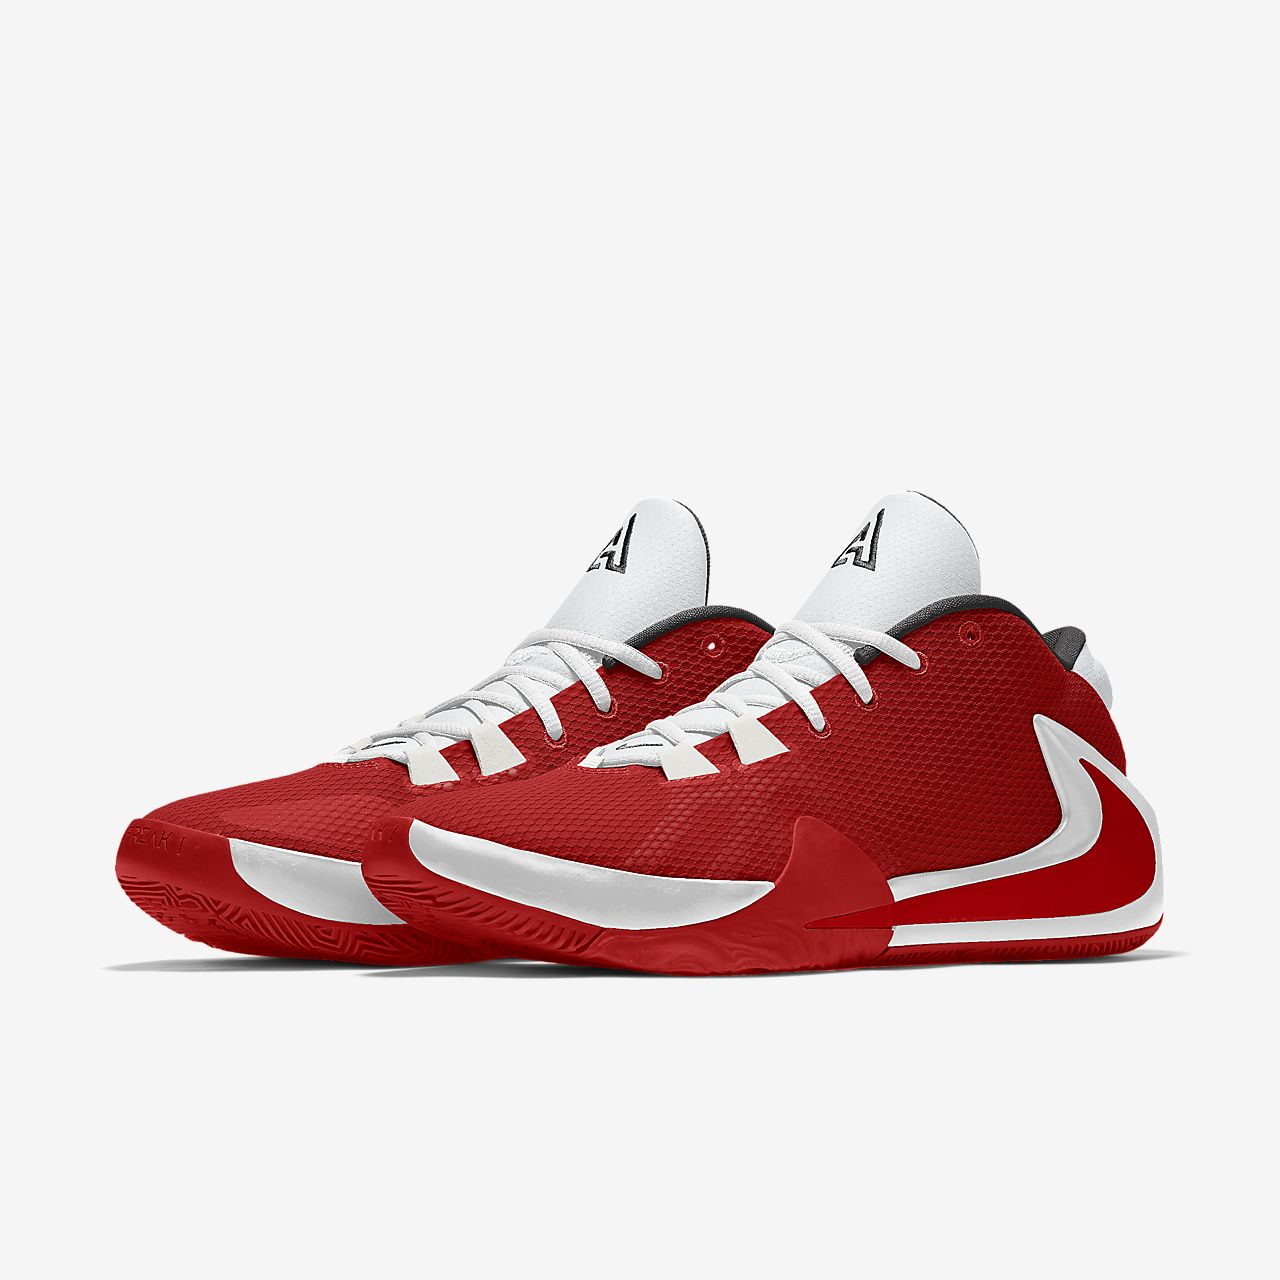 Sapatilhas de basquetebol personalizáveis Nike Zoom Freak 1 By You